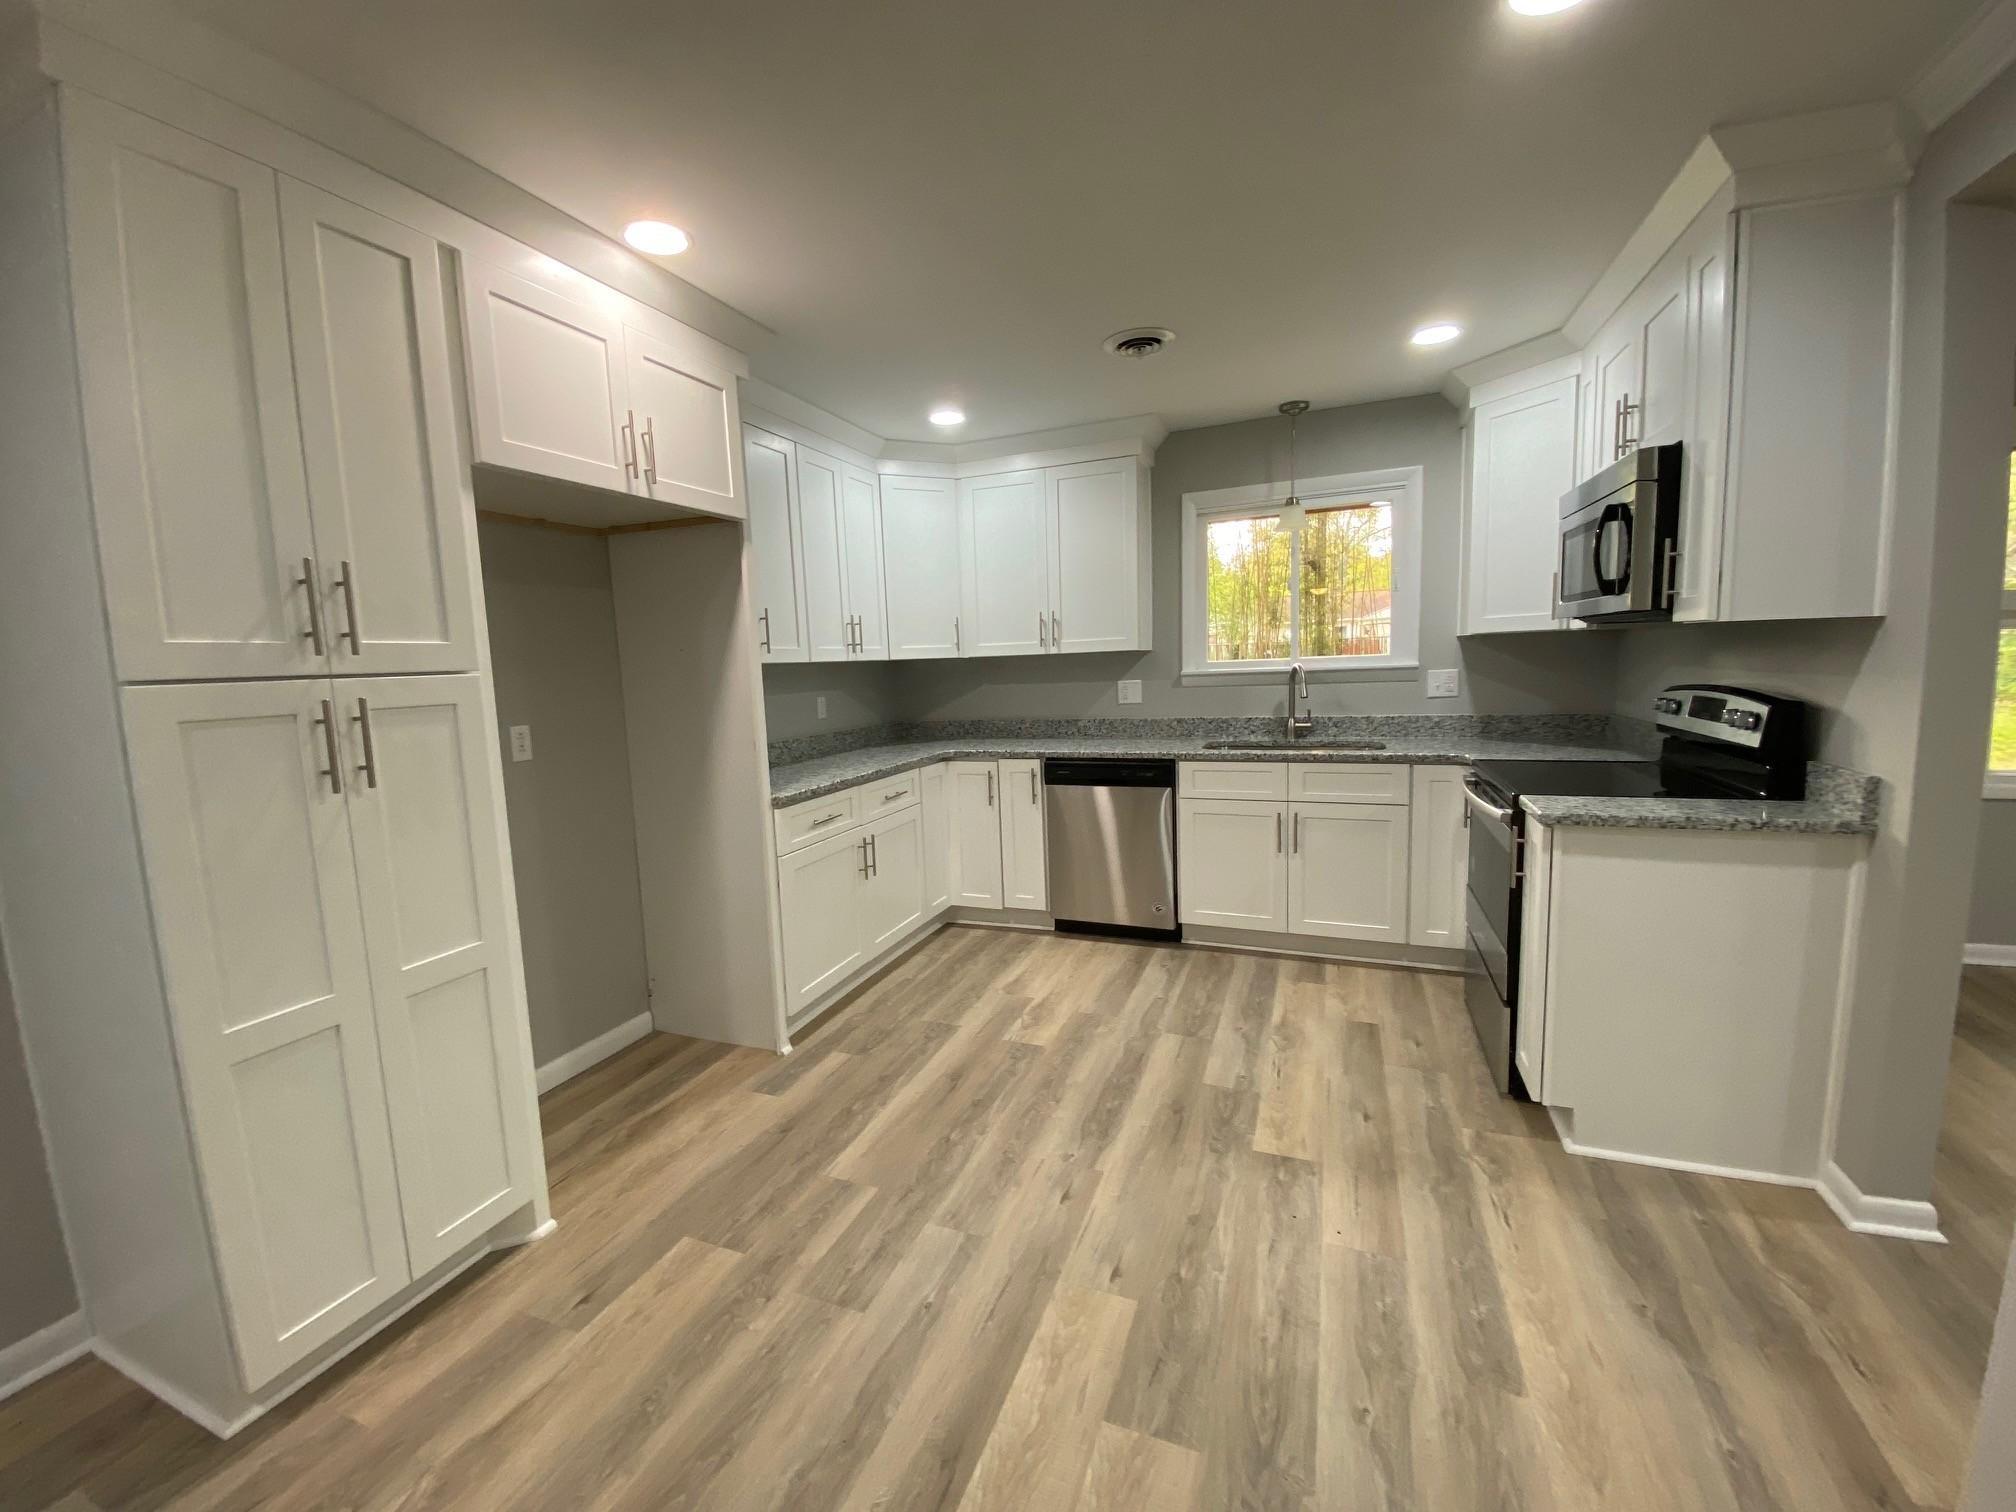 304 Marbeth Ln Property Photo - Tullahoma, TN real estate listing